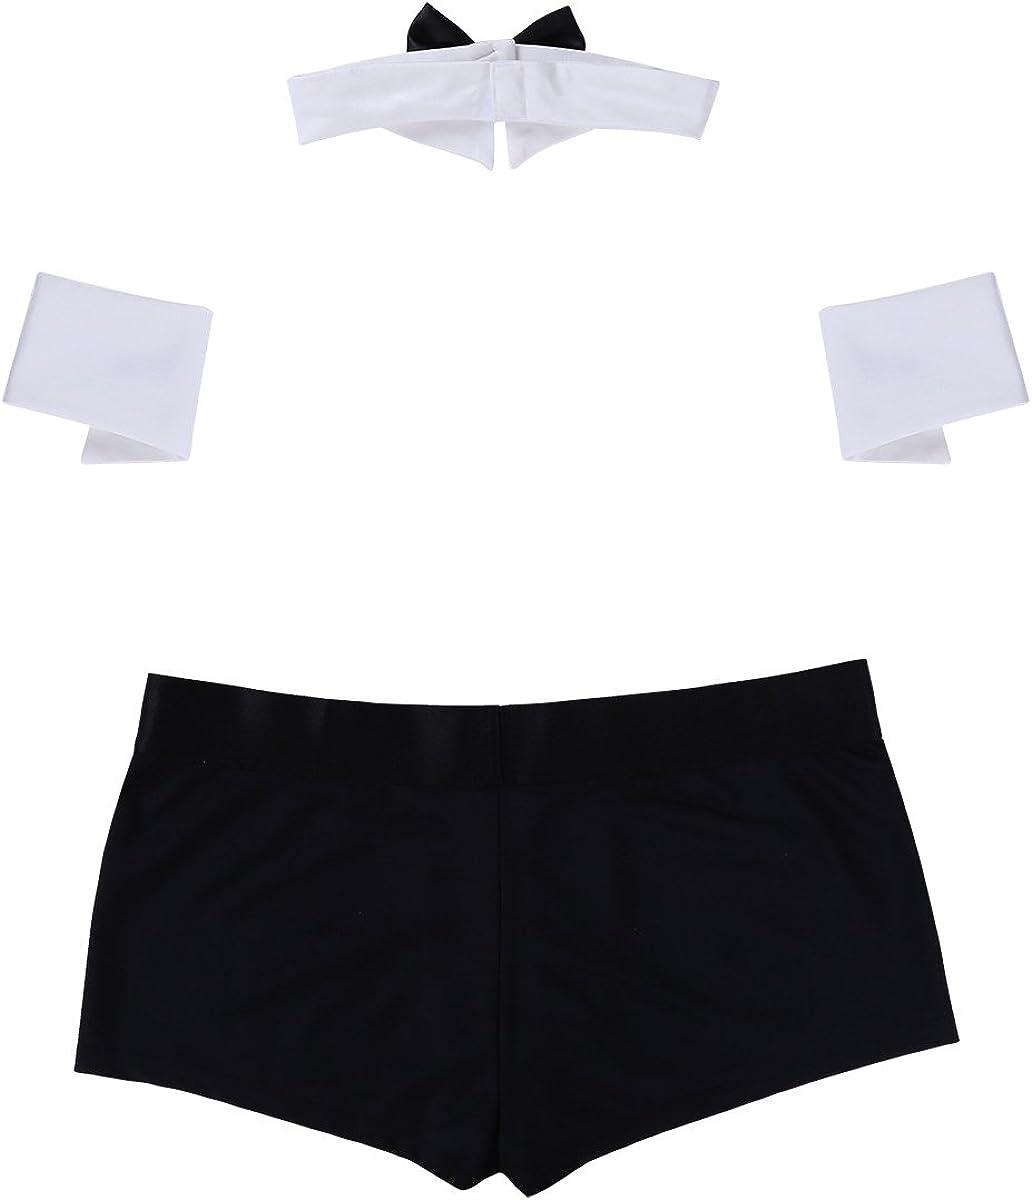 Mens Butler Lingerie Underwear Costume 3Pcs Tuxedo Thong G-string Collar Cuffs